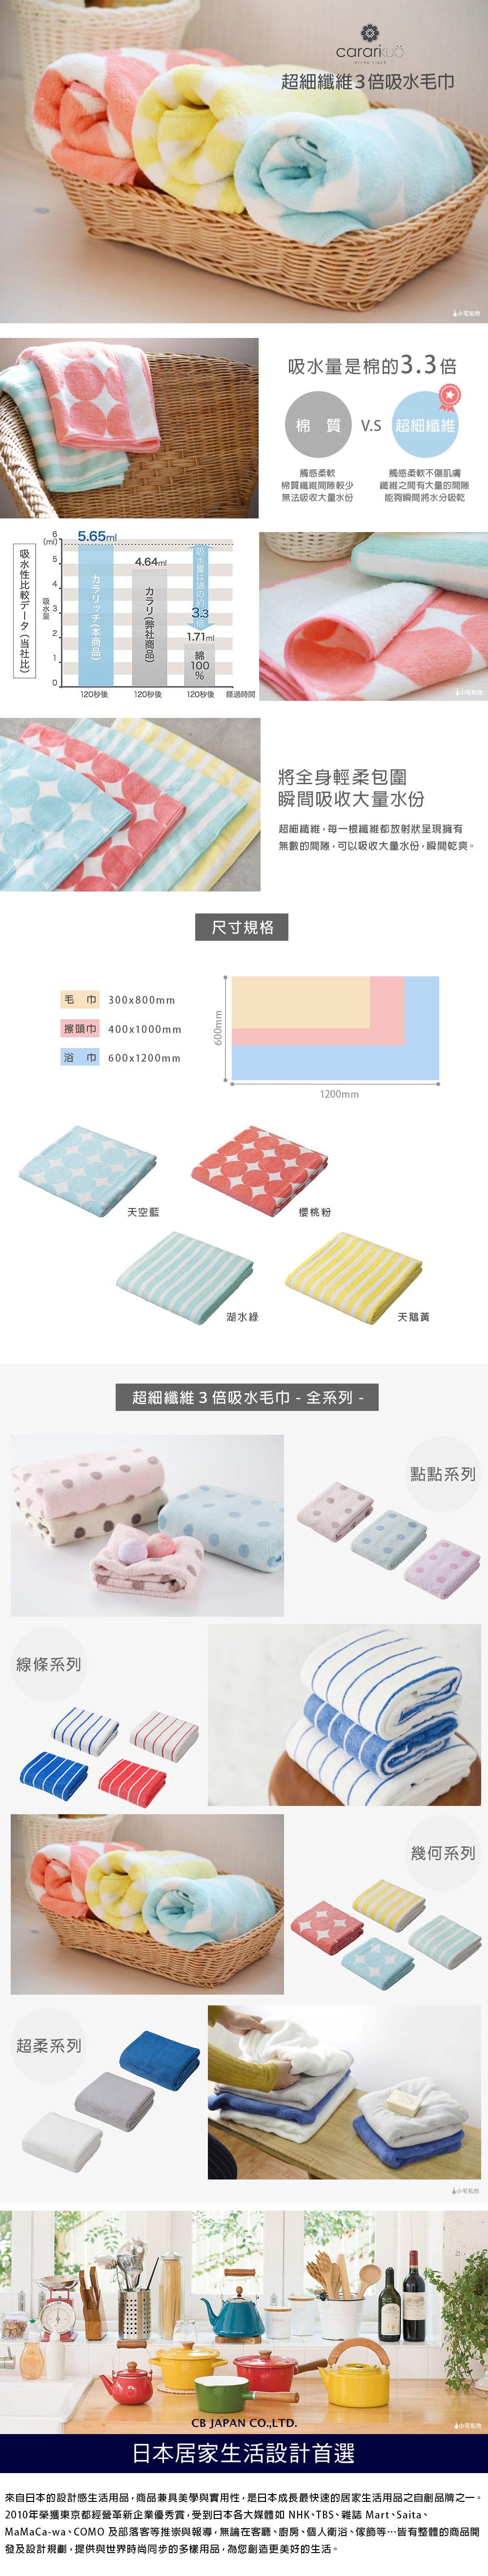 CB Japan 泡泡糖 幾何系列 超細纖維3倍吸水毛巾 - 湖水綠